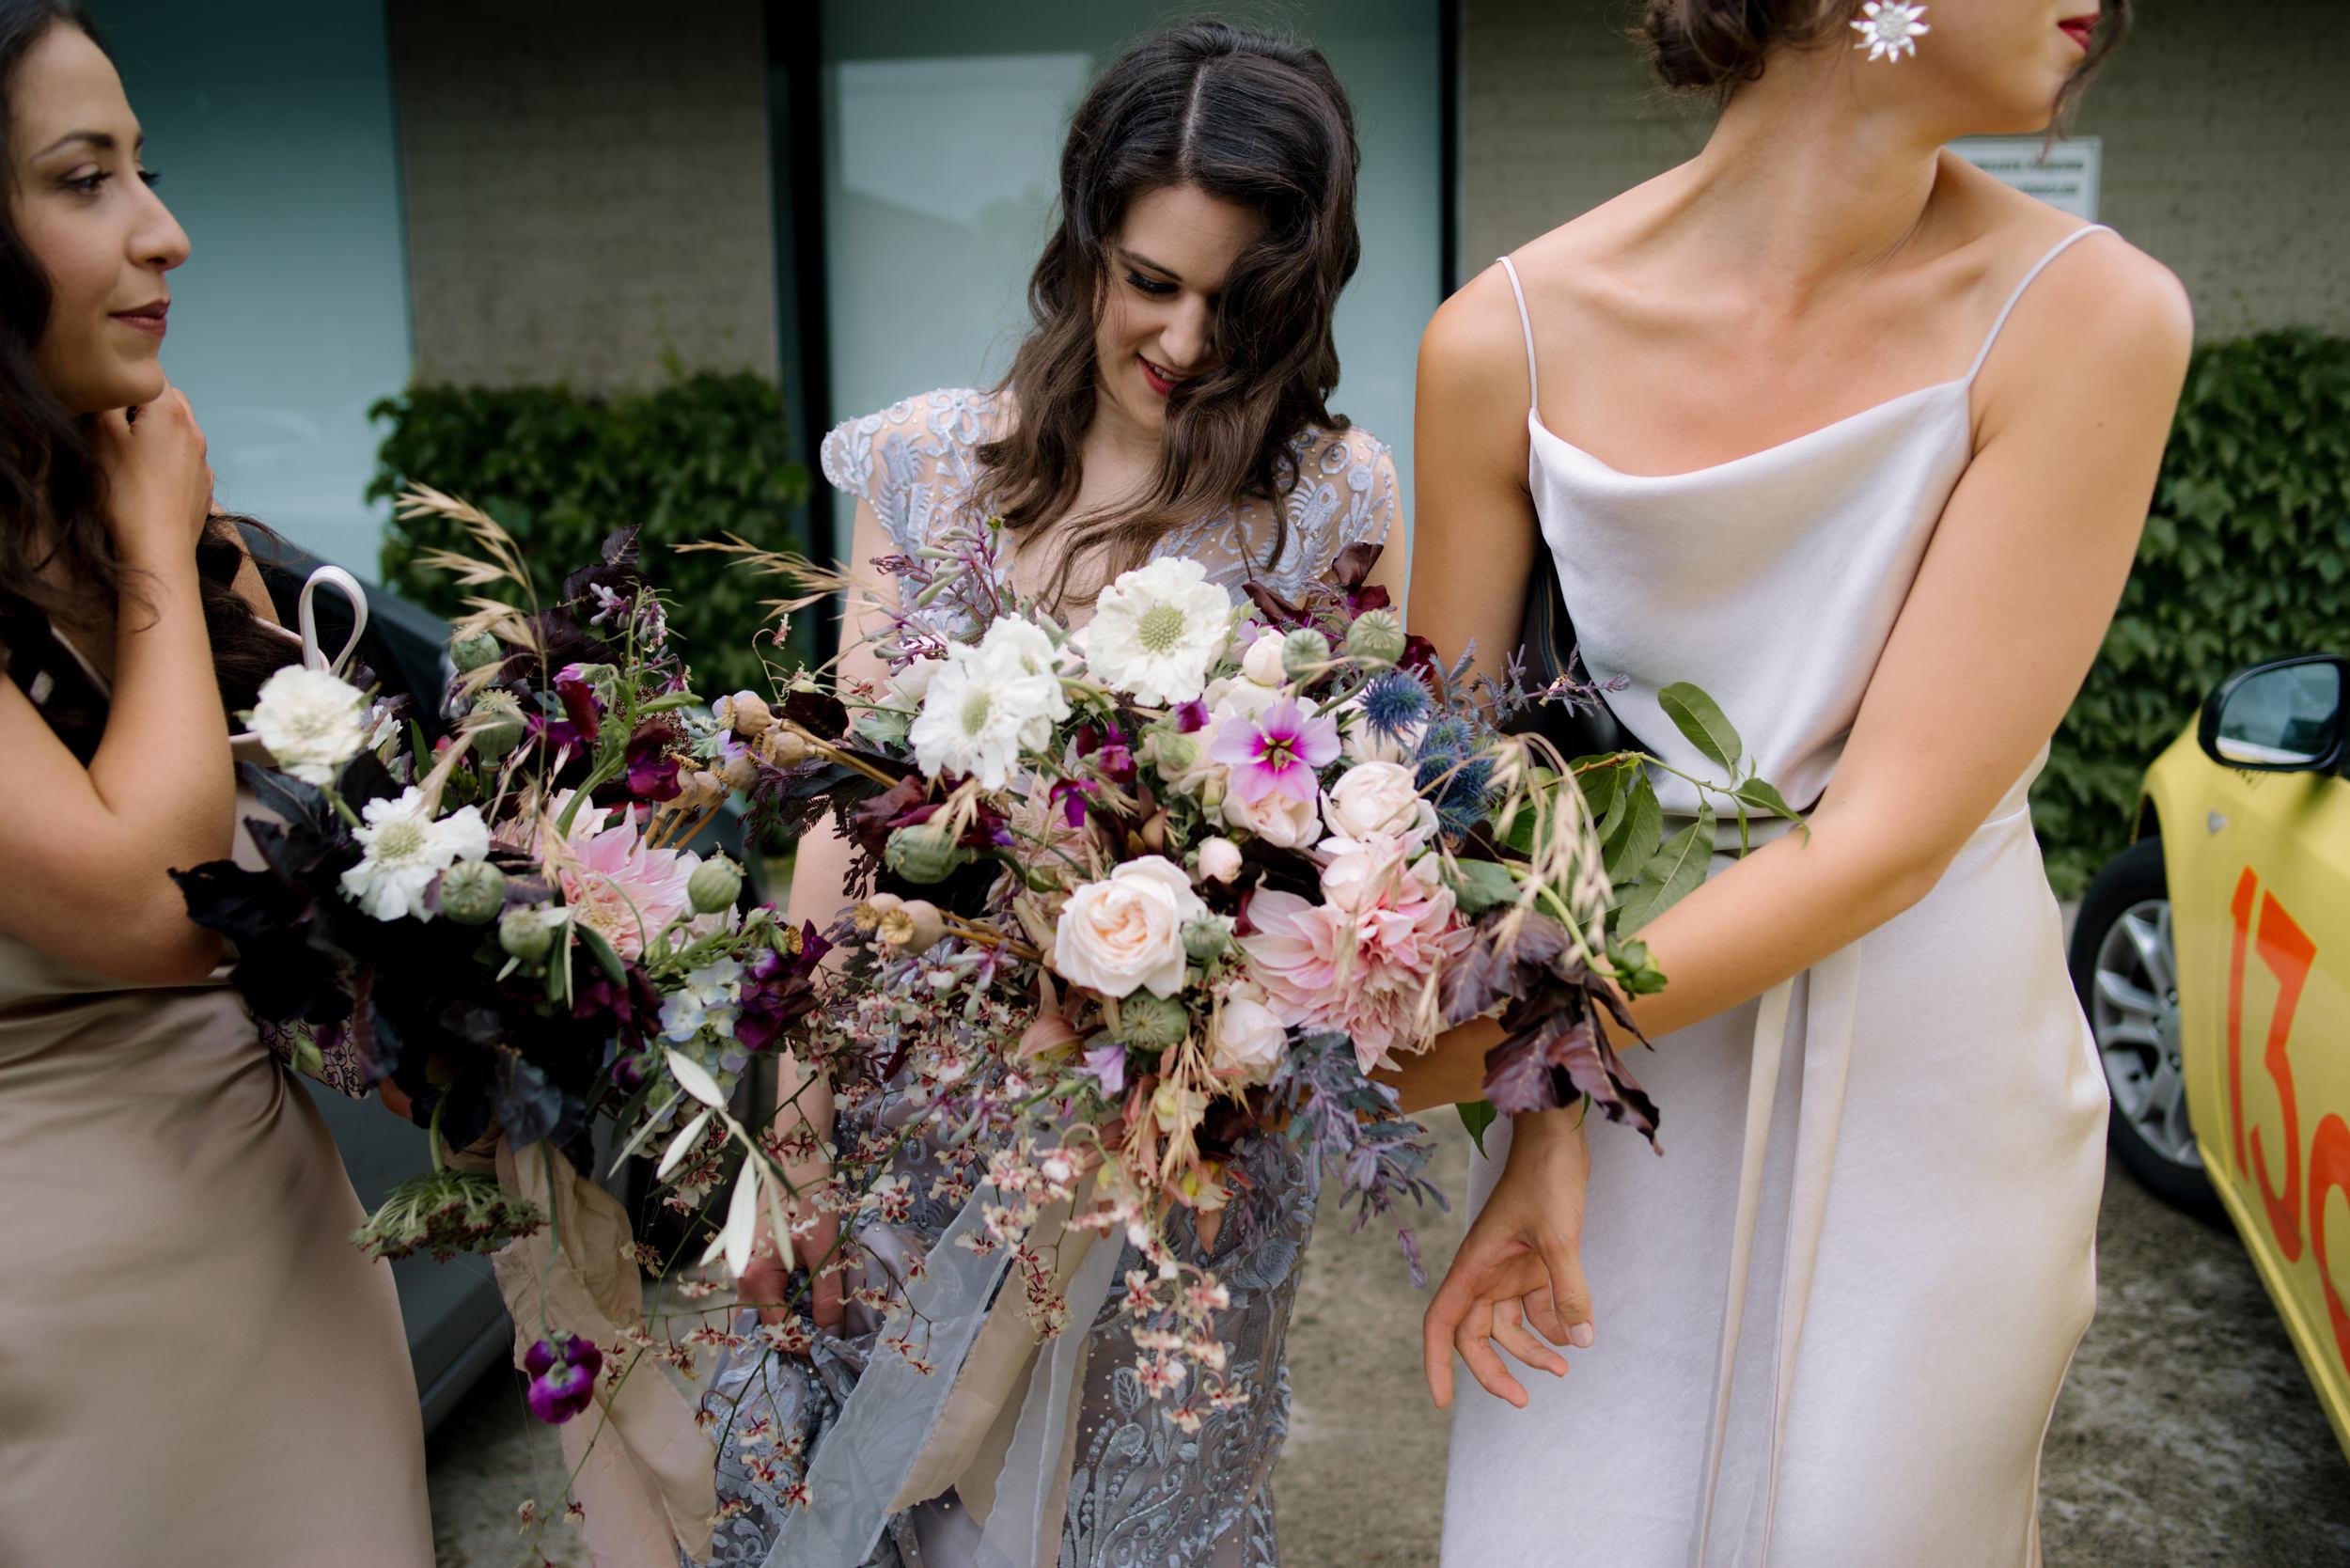 I-Got-You-Babe-&.Co.-Glasshaus-Wedding-Charlotte-Cameron0052.JPG